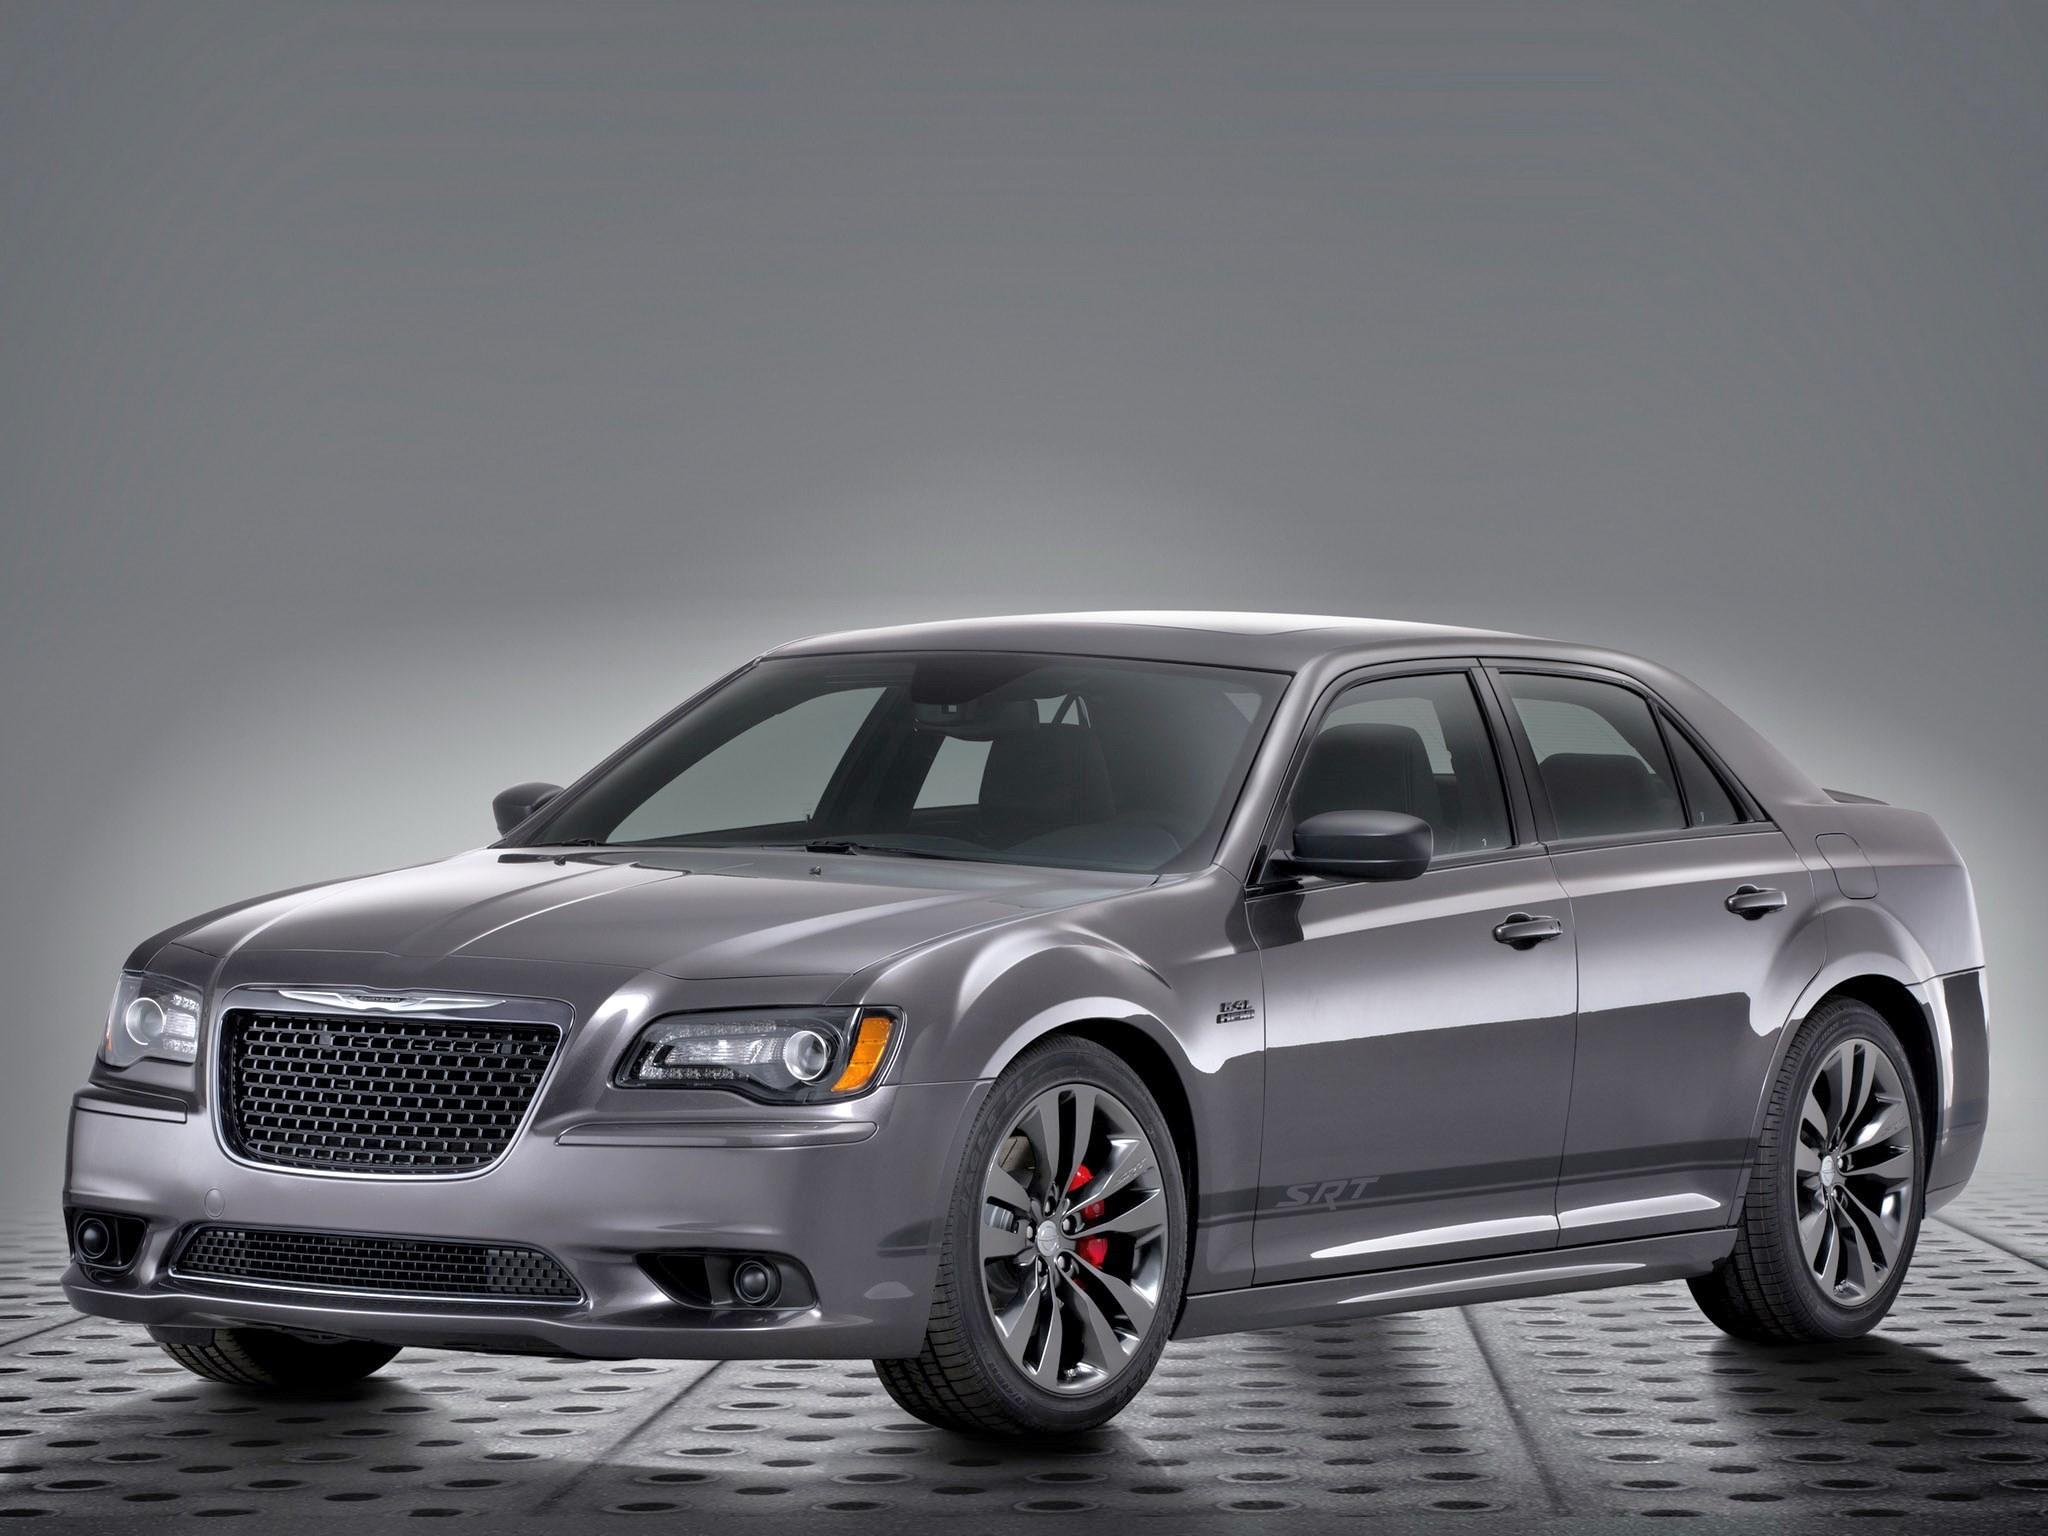 2014 chrysler 300 srt8 satin vapor photoscar nice cars. Black Bedroom Furniture Sets. Home Design Ideas